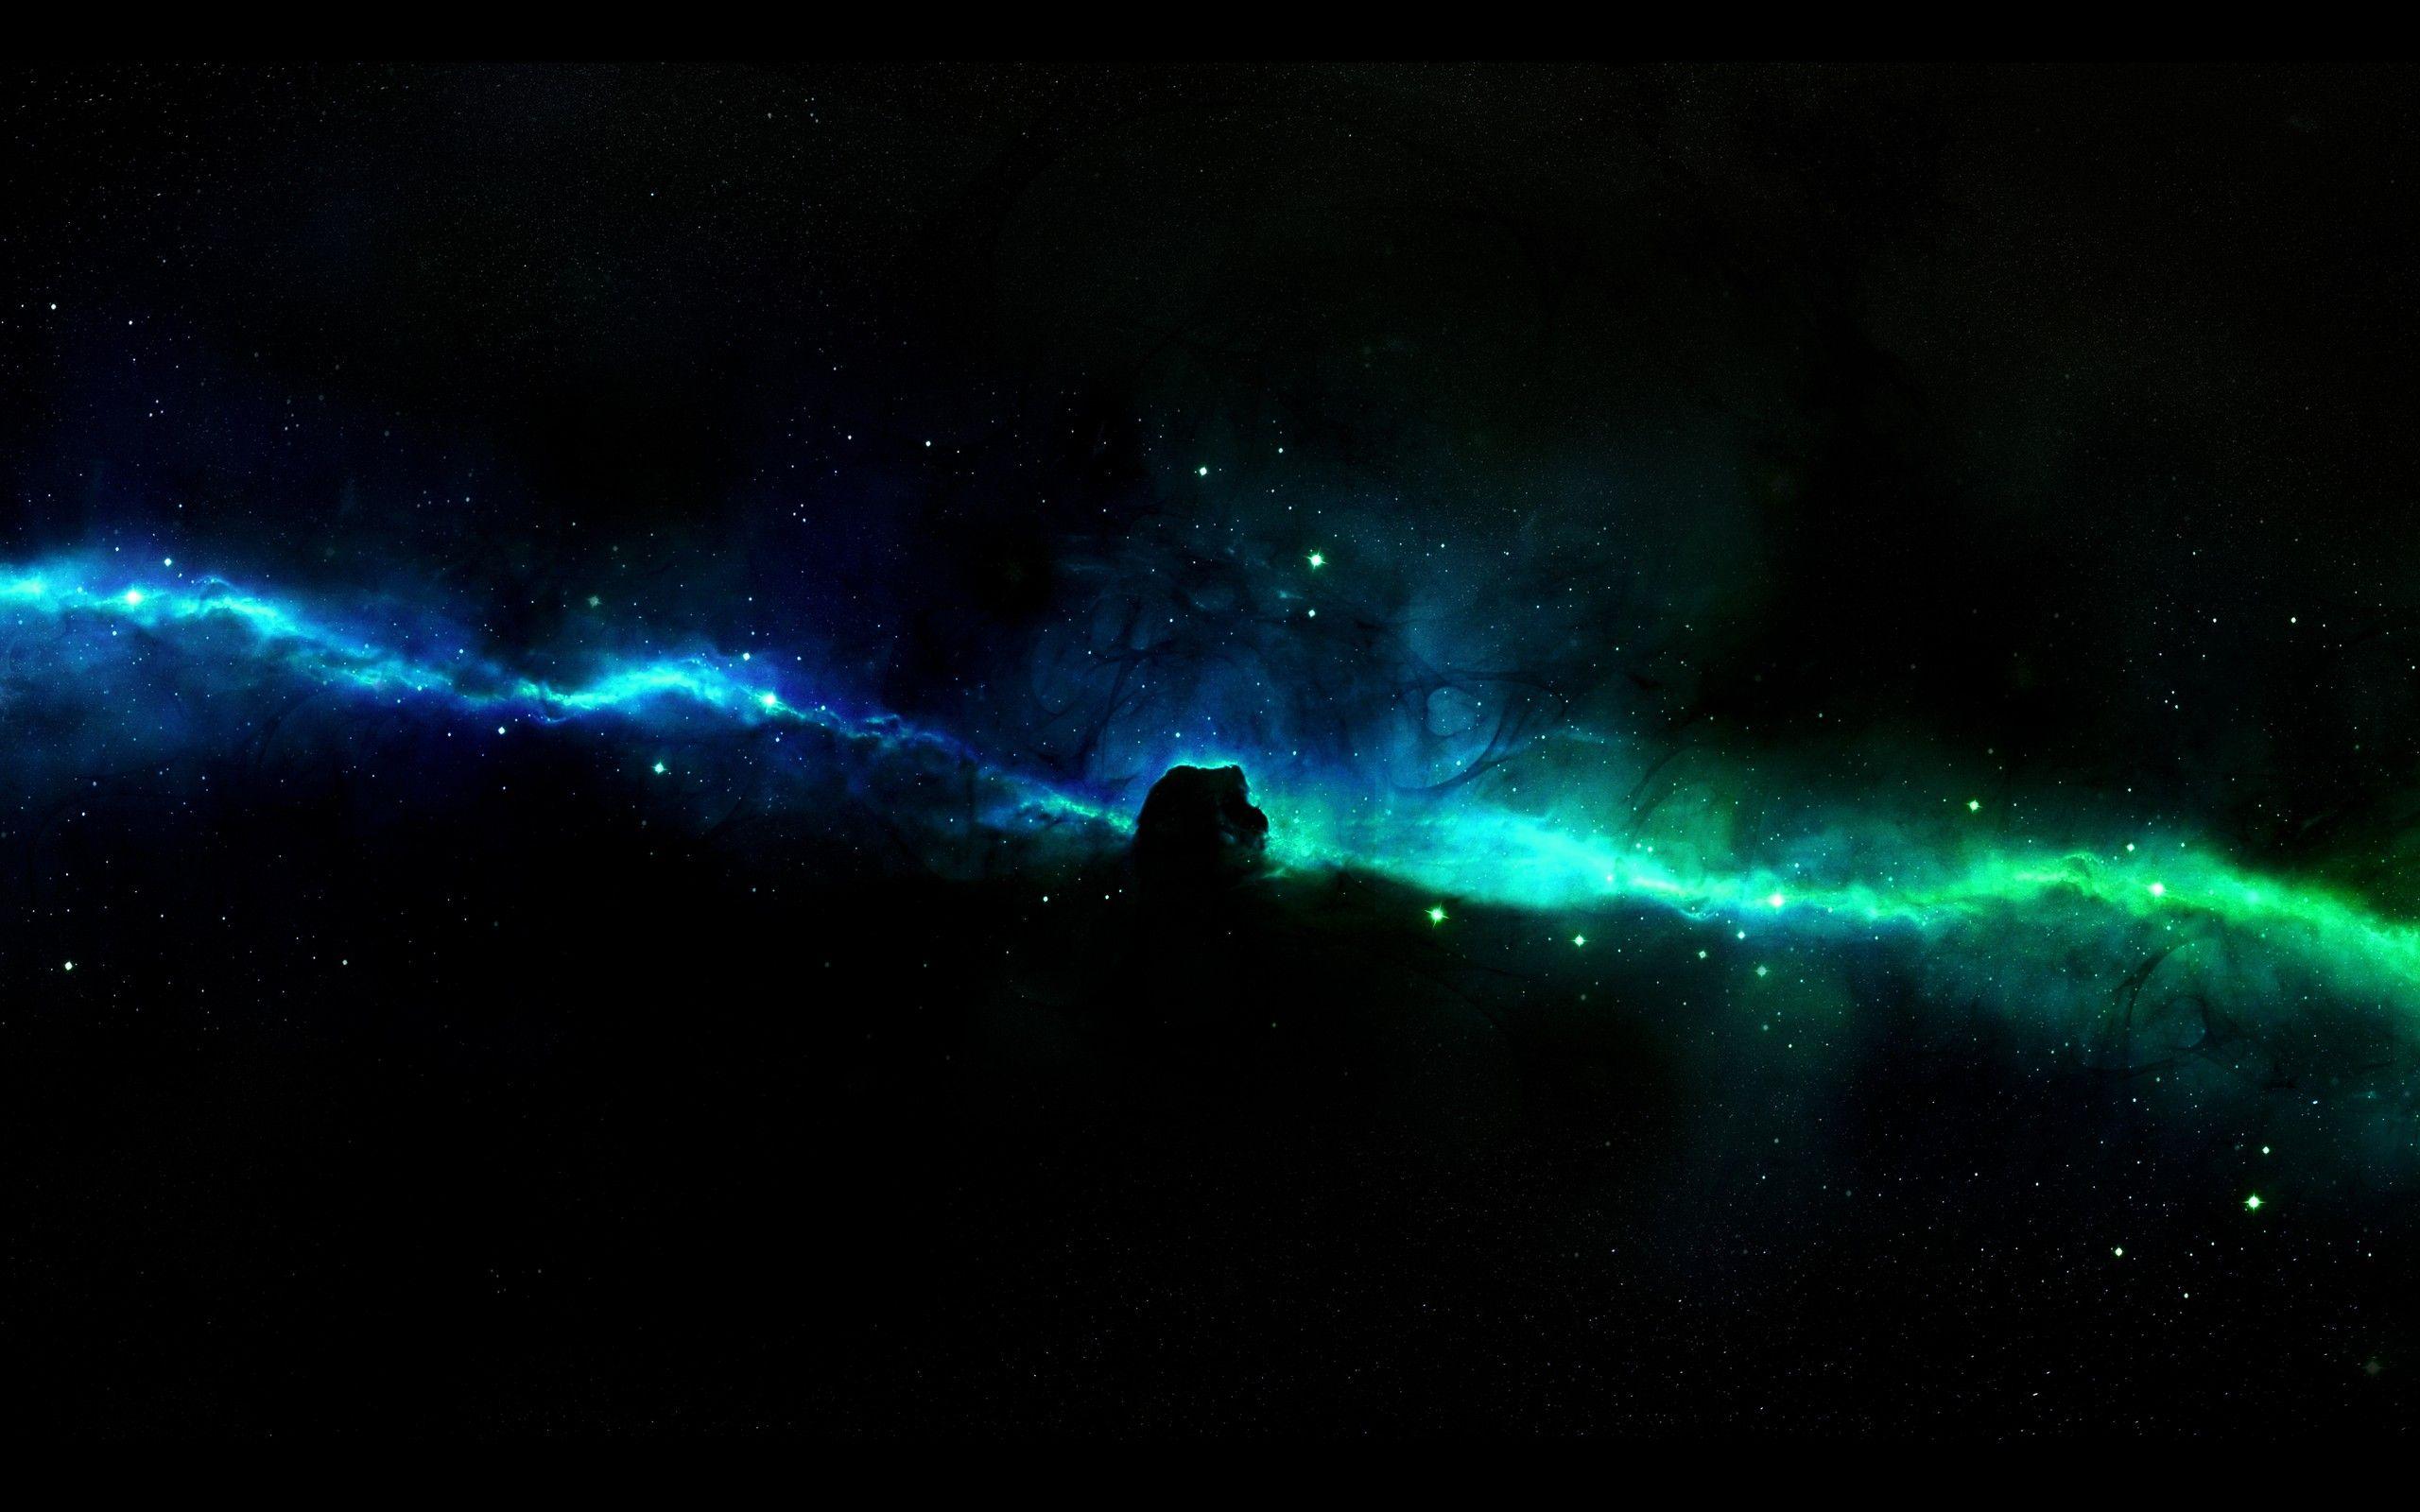 Download Wallpaper Horse Nebula - e7848db2c8bef73c9720708550645b3f  Perfect Image Reference_7937.jpg